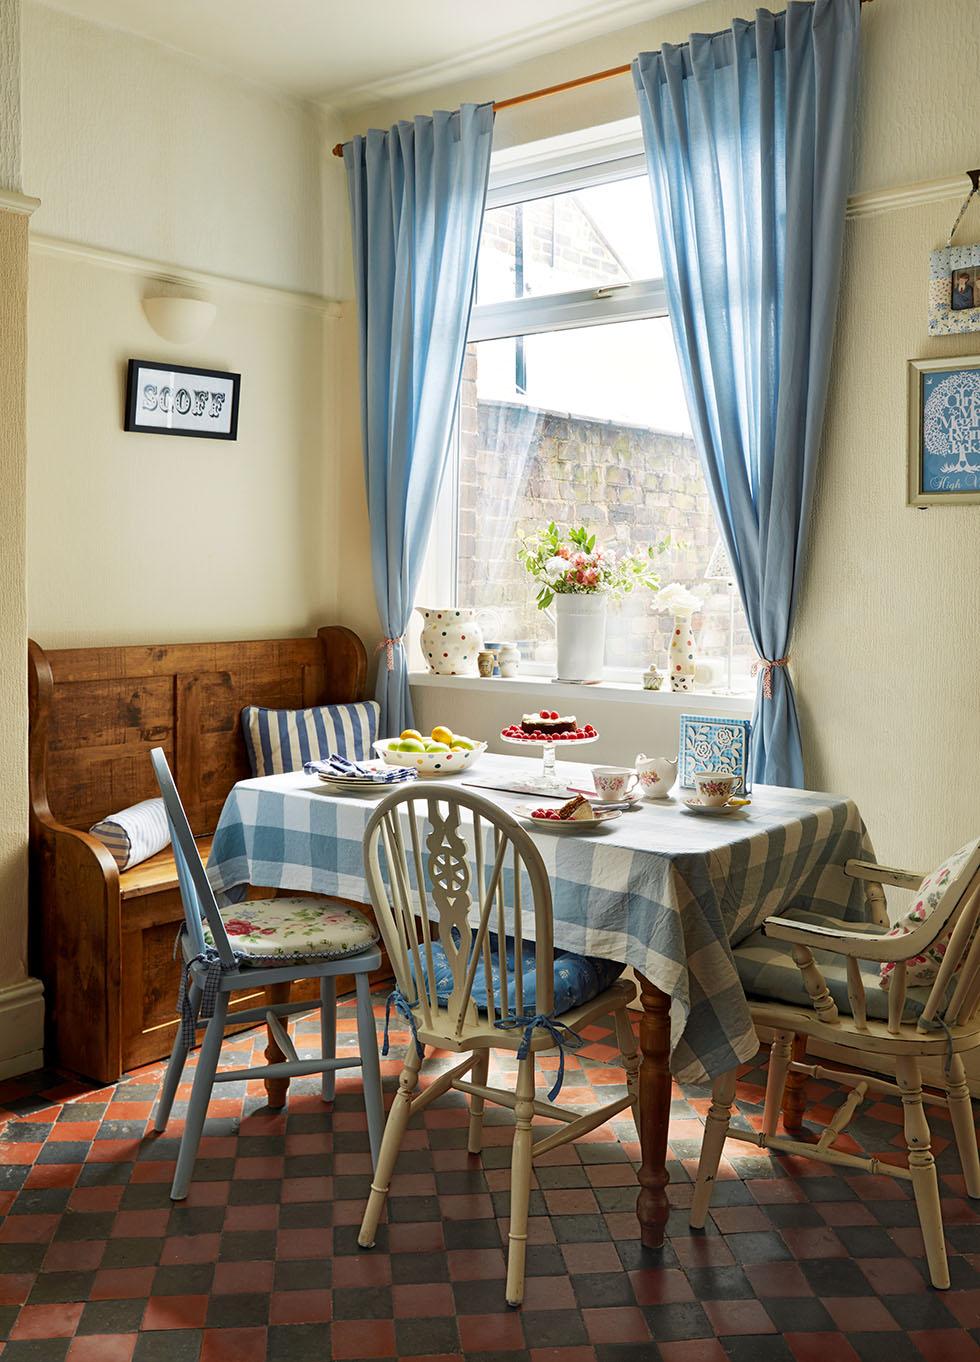 prescott-davies-dining-table